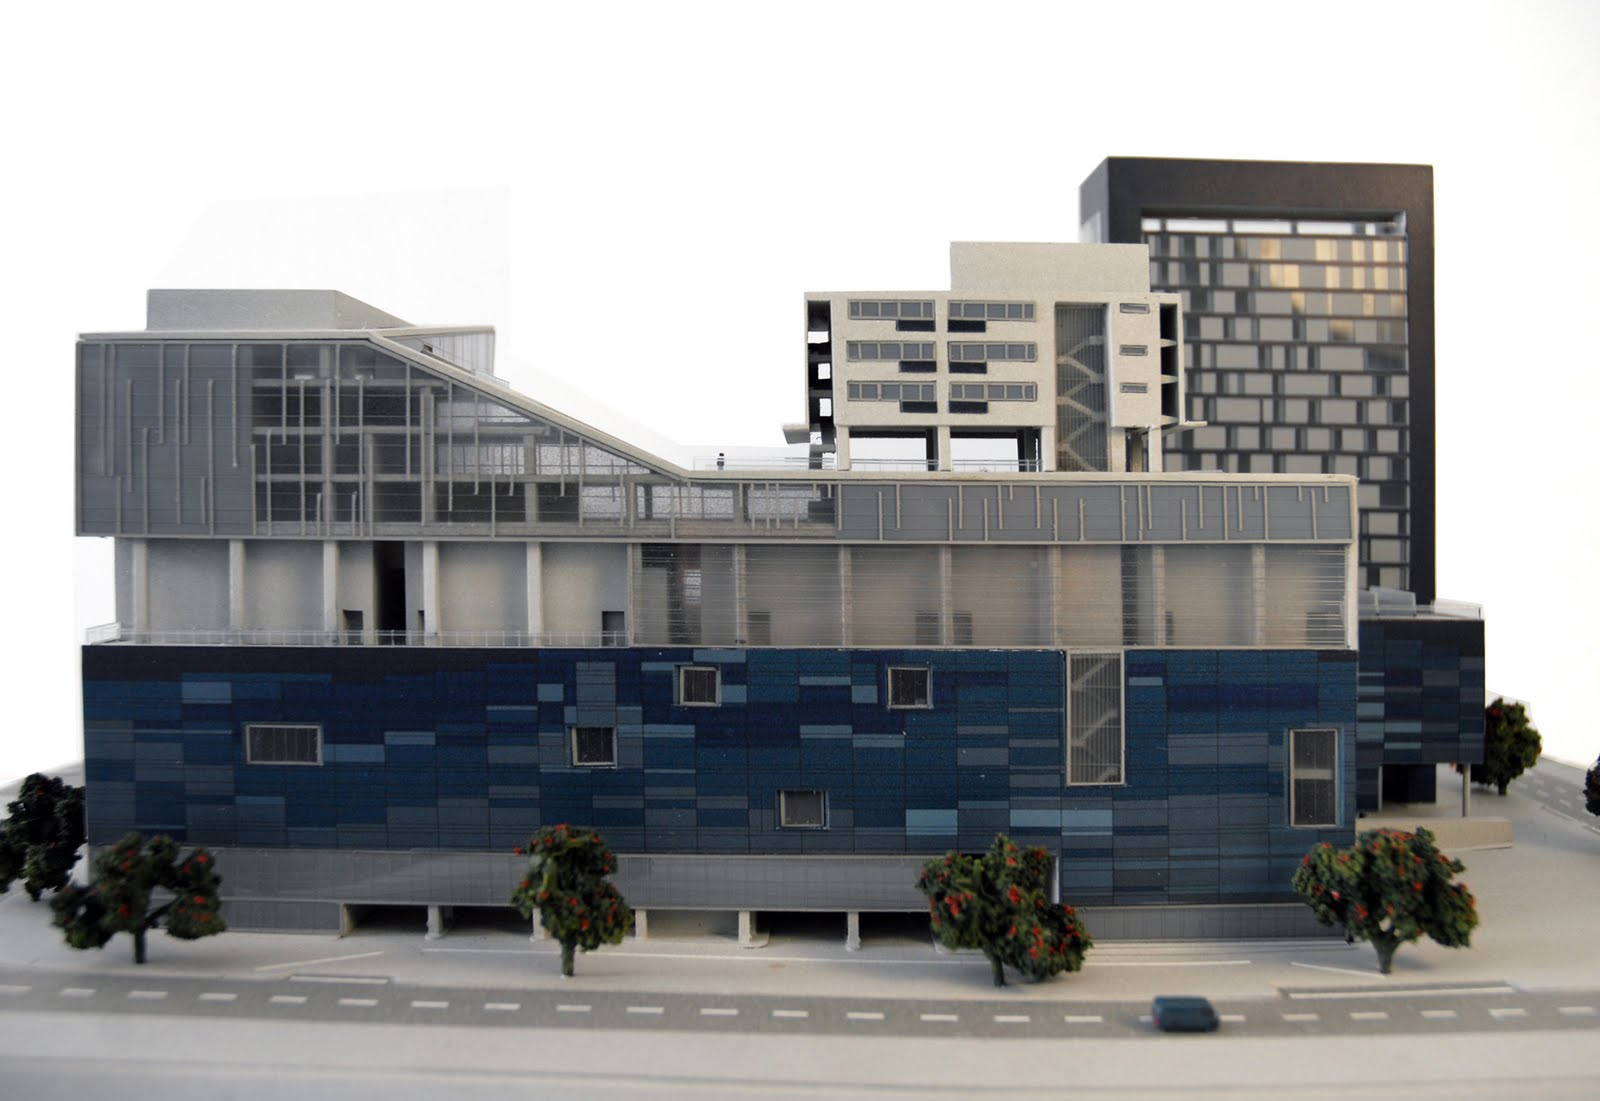 Oda oficina de arquitectura recreo lacastellana - Oficinas de arquitectura ...